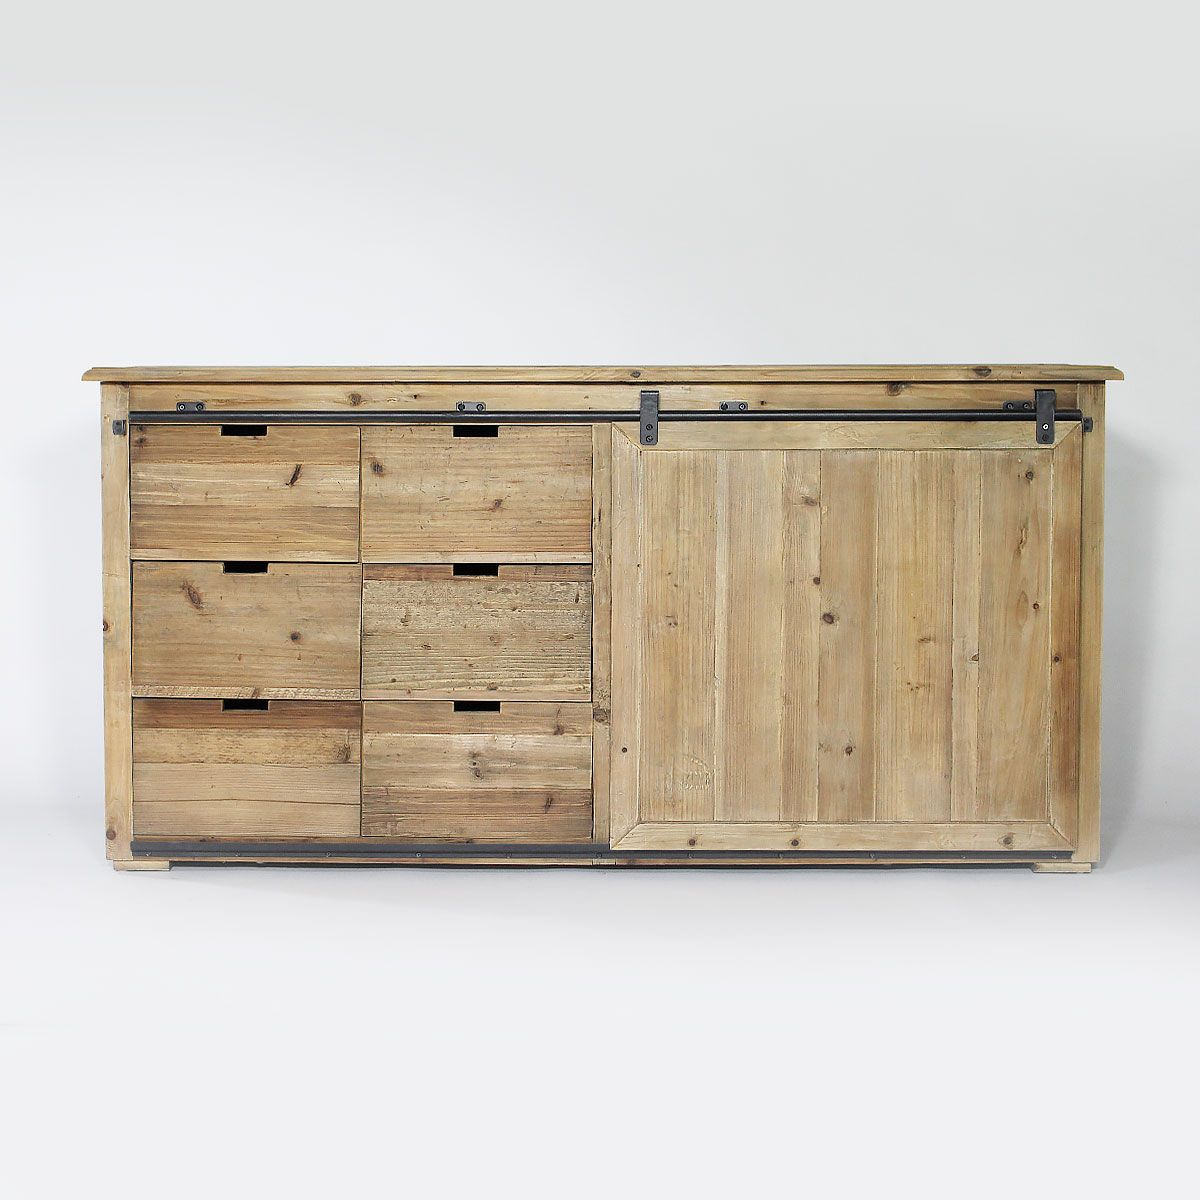 buffet industriel porte coulissante 6 tiroirs bois recycl portes coulissantes bois recycl. Black Bedroom Furniture Sets. Home Design Ideas